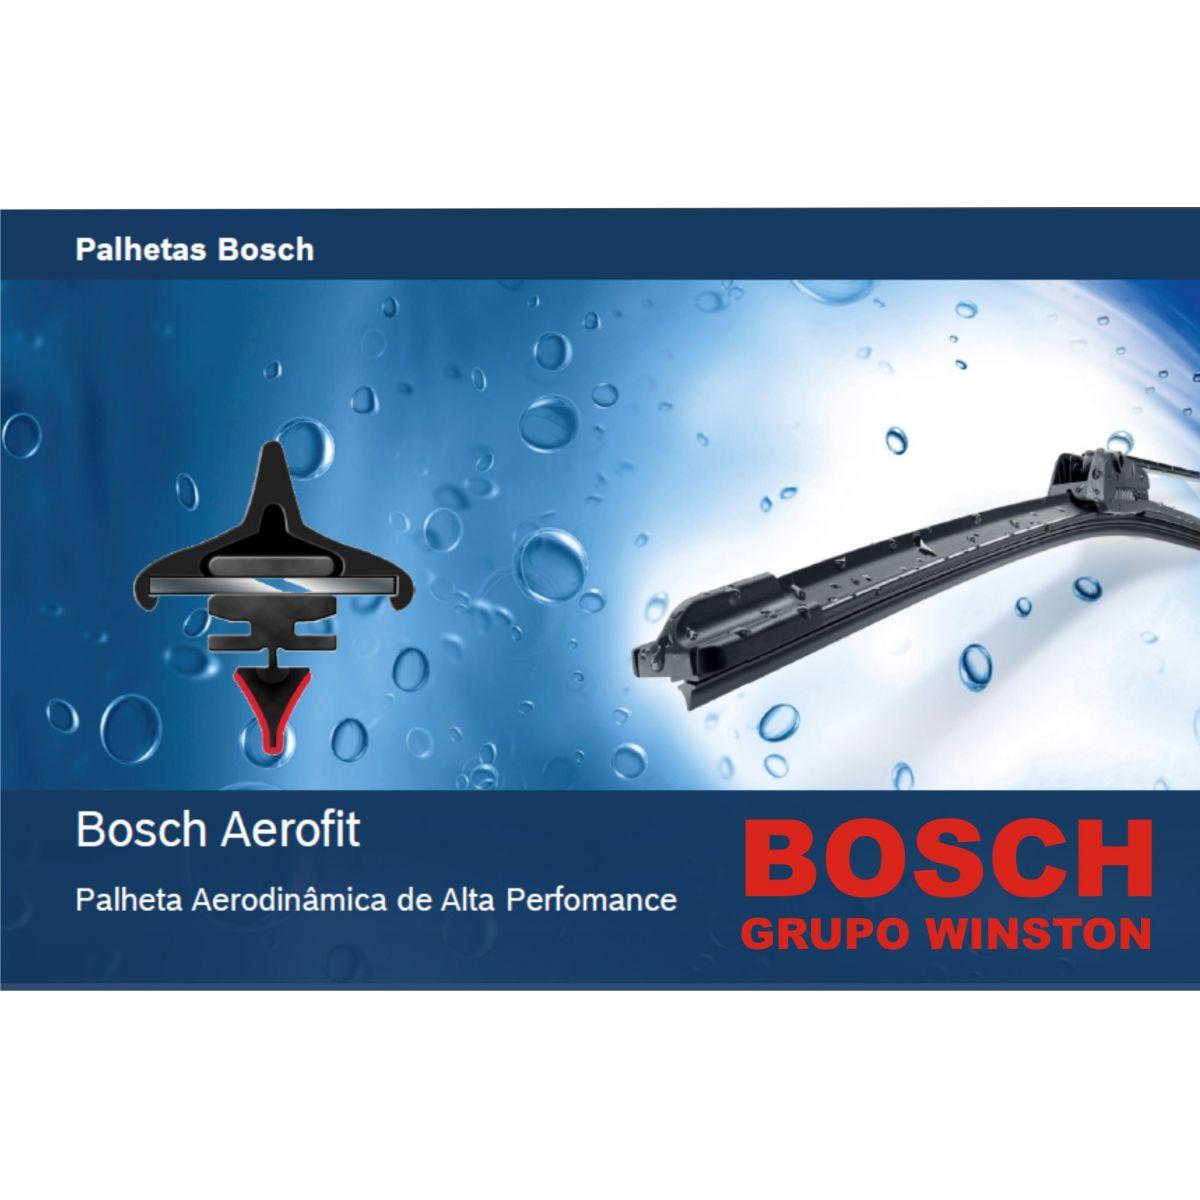 Palheta Bosch Aerofit Limpador de para brisa Bosch RENAULT Express